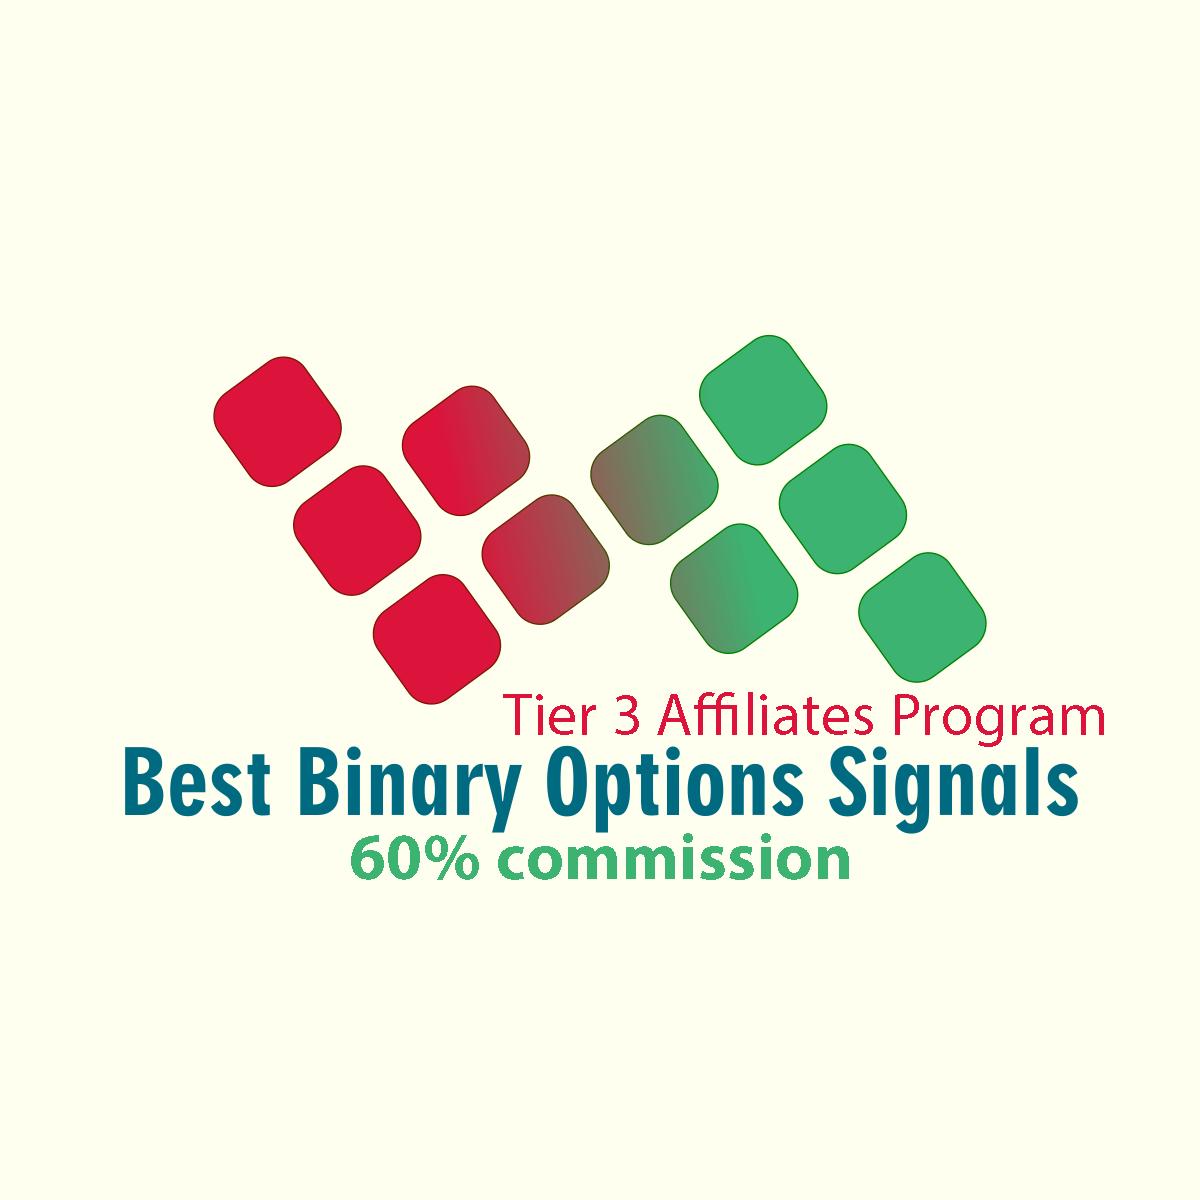 Best Binary Options Signals Affiliates Program